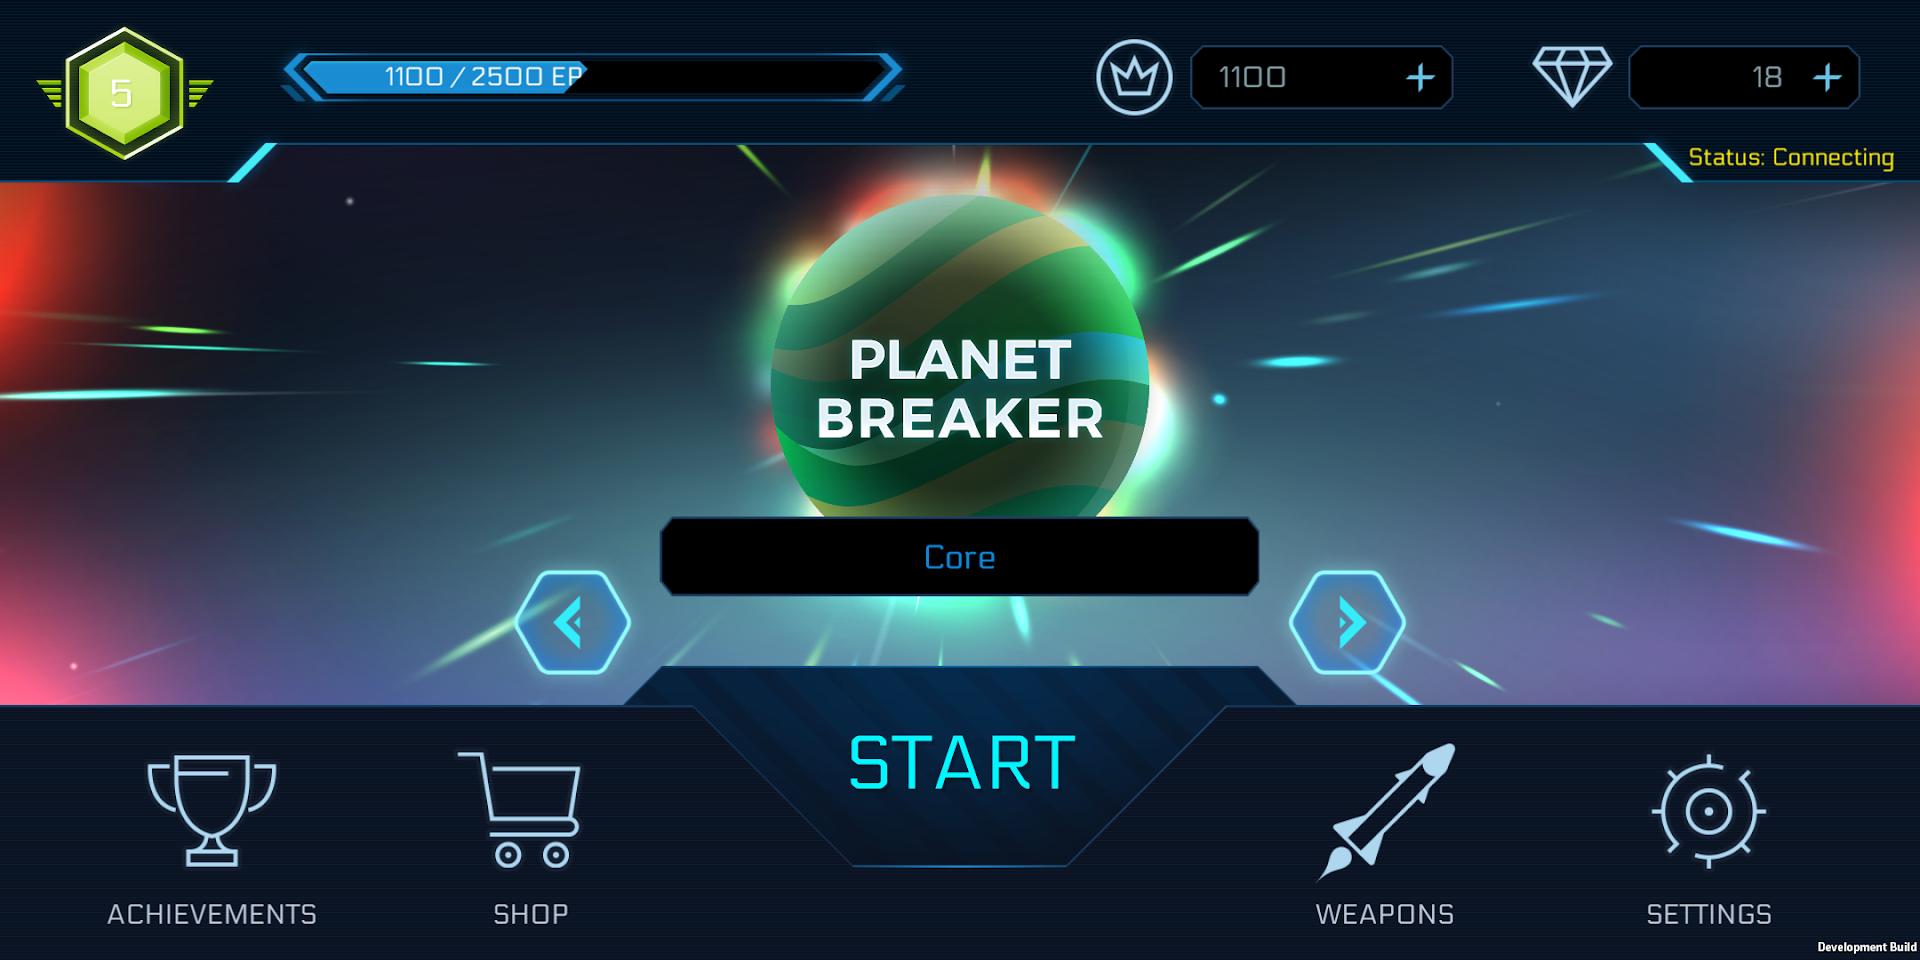 Planet Breakers mainscreen